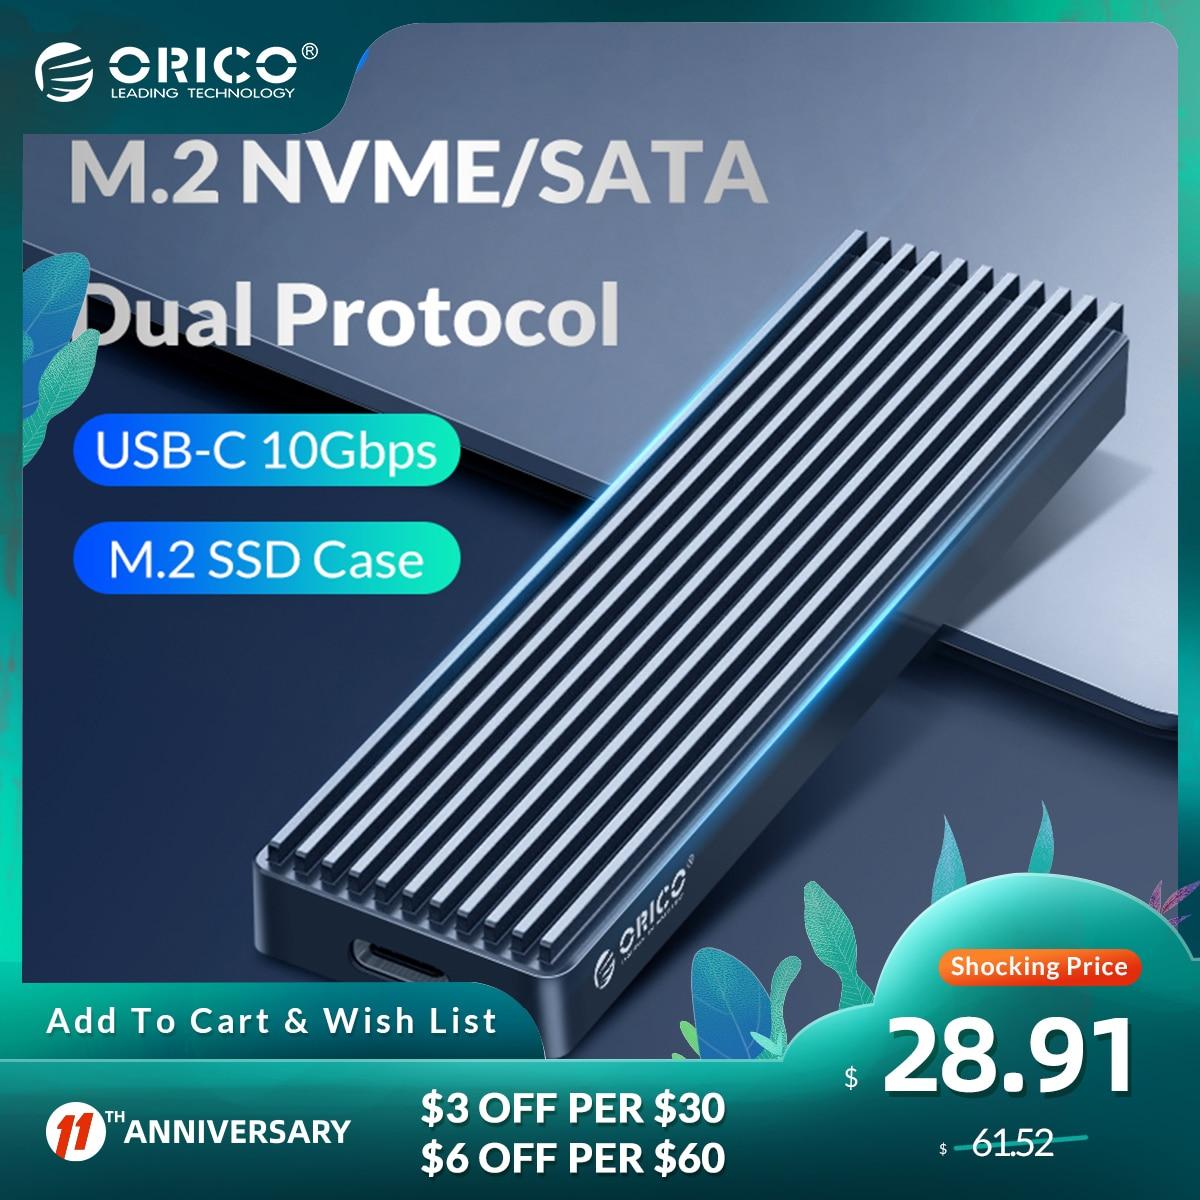 ORICO Dual Protocol M.2 SSD Case Support M2 NVME NGFF SATA SSD Disk For PCIE M Key B+M Key USB C 10Gbps Hard Drive Enclosure